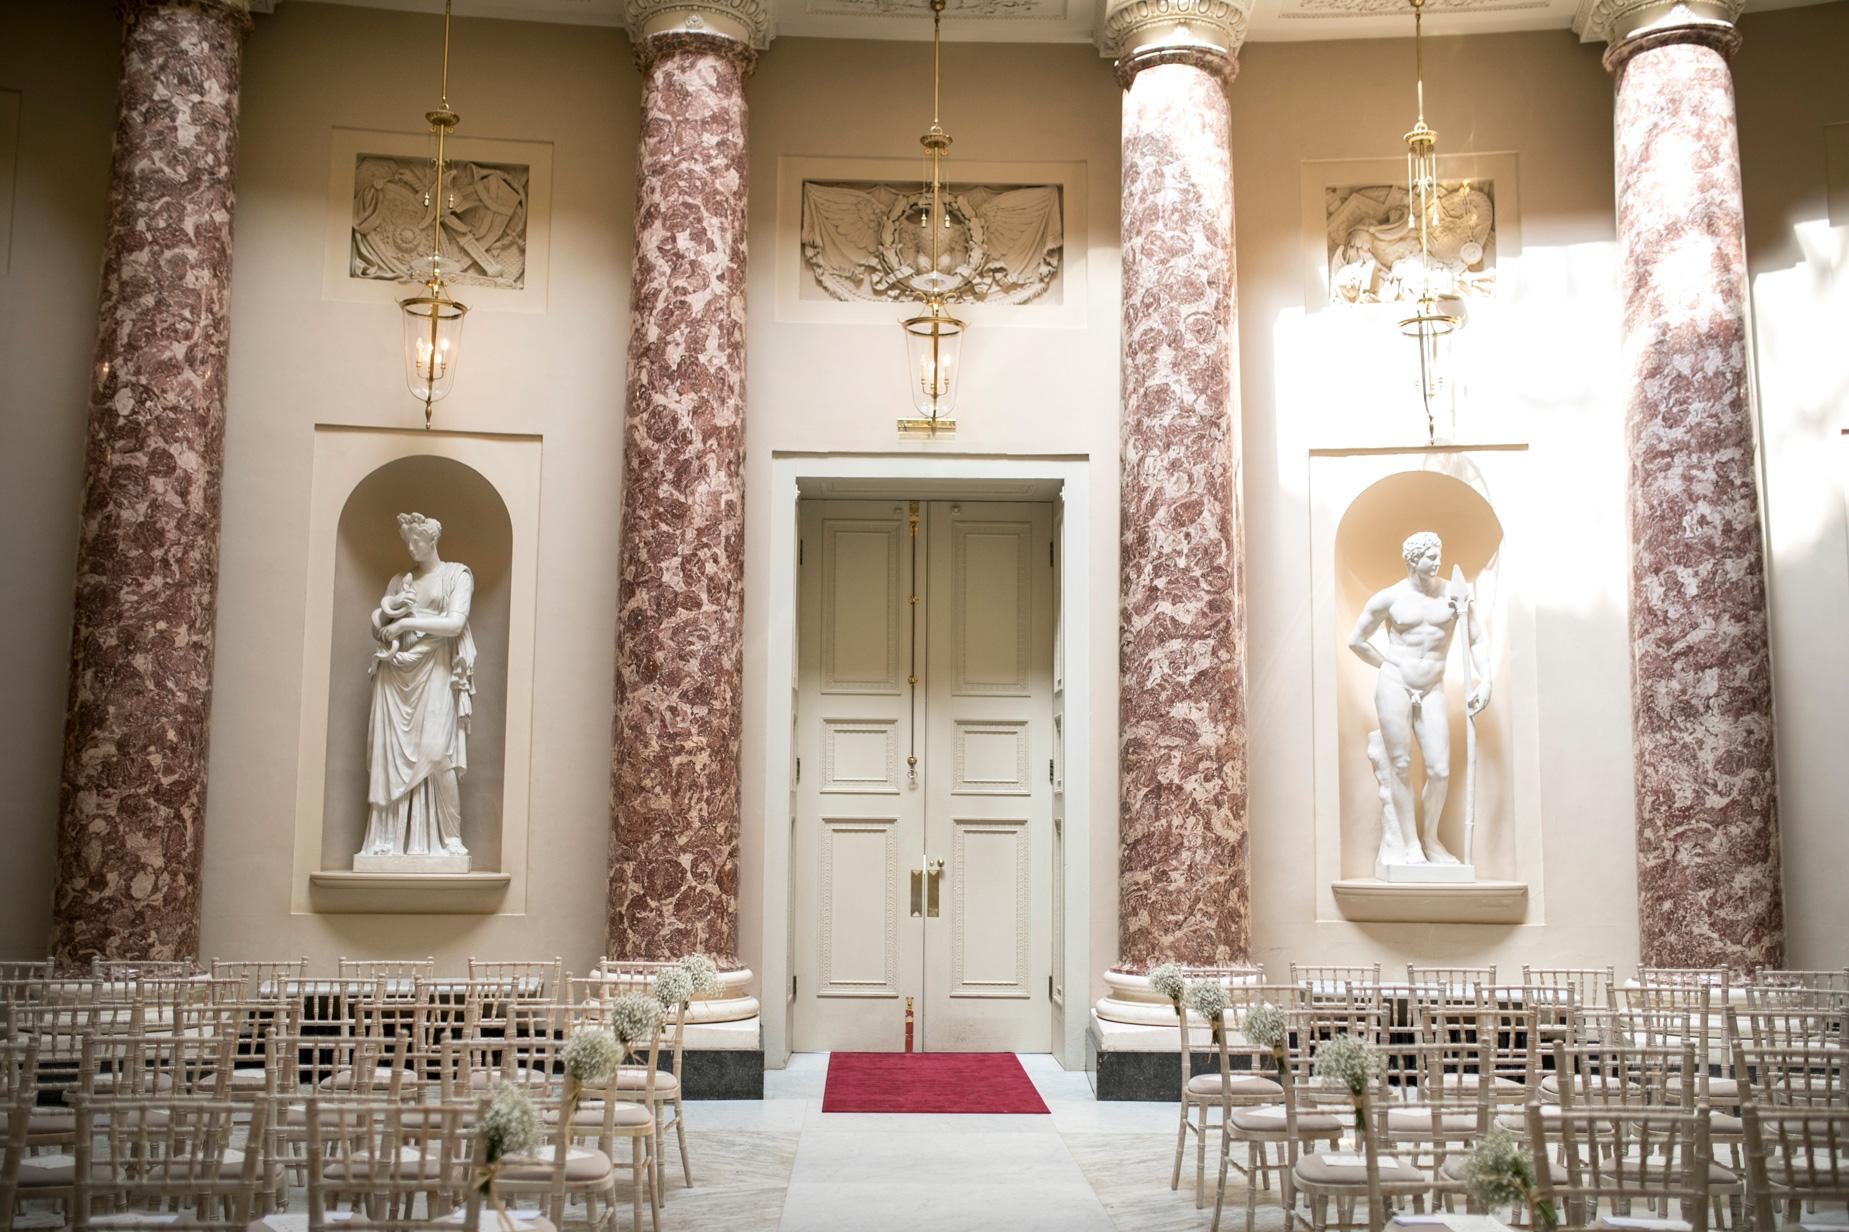 Stowe, details, pink room,